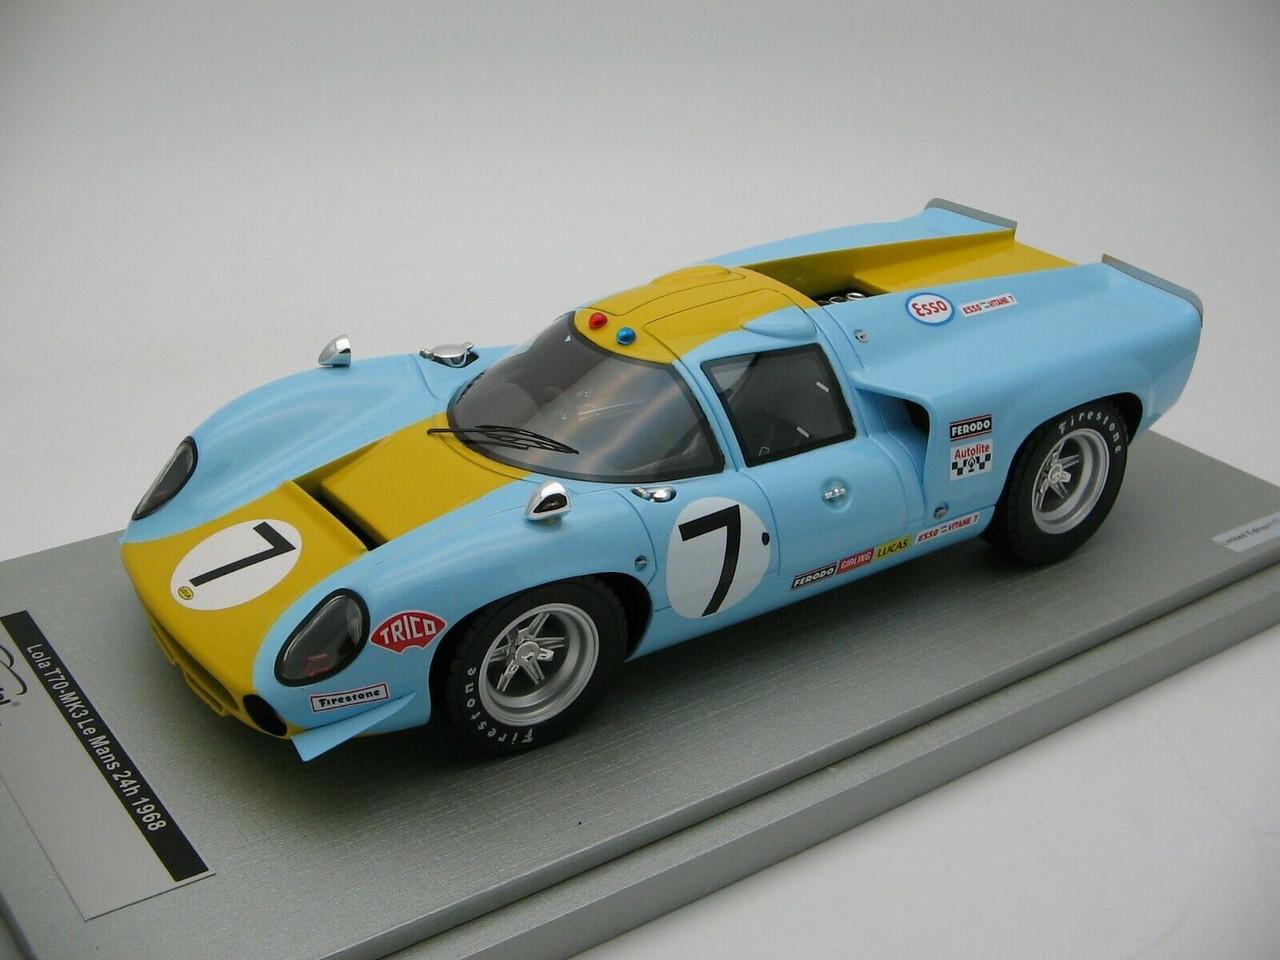 TM18-67C 1//18 Scale Tecnomodel Lola T70 MK3 Nurburgring 1000 km 1967 Car #1P